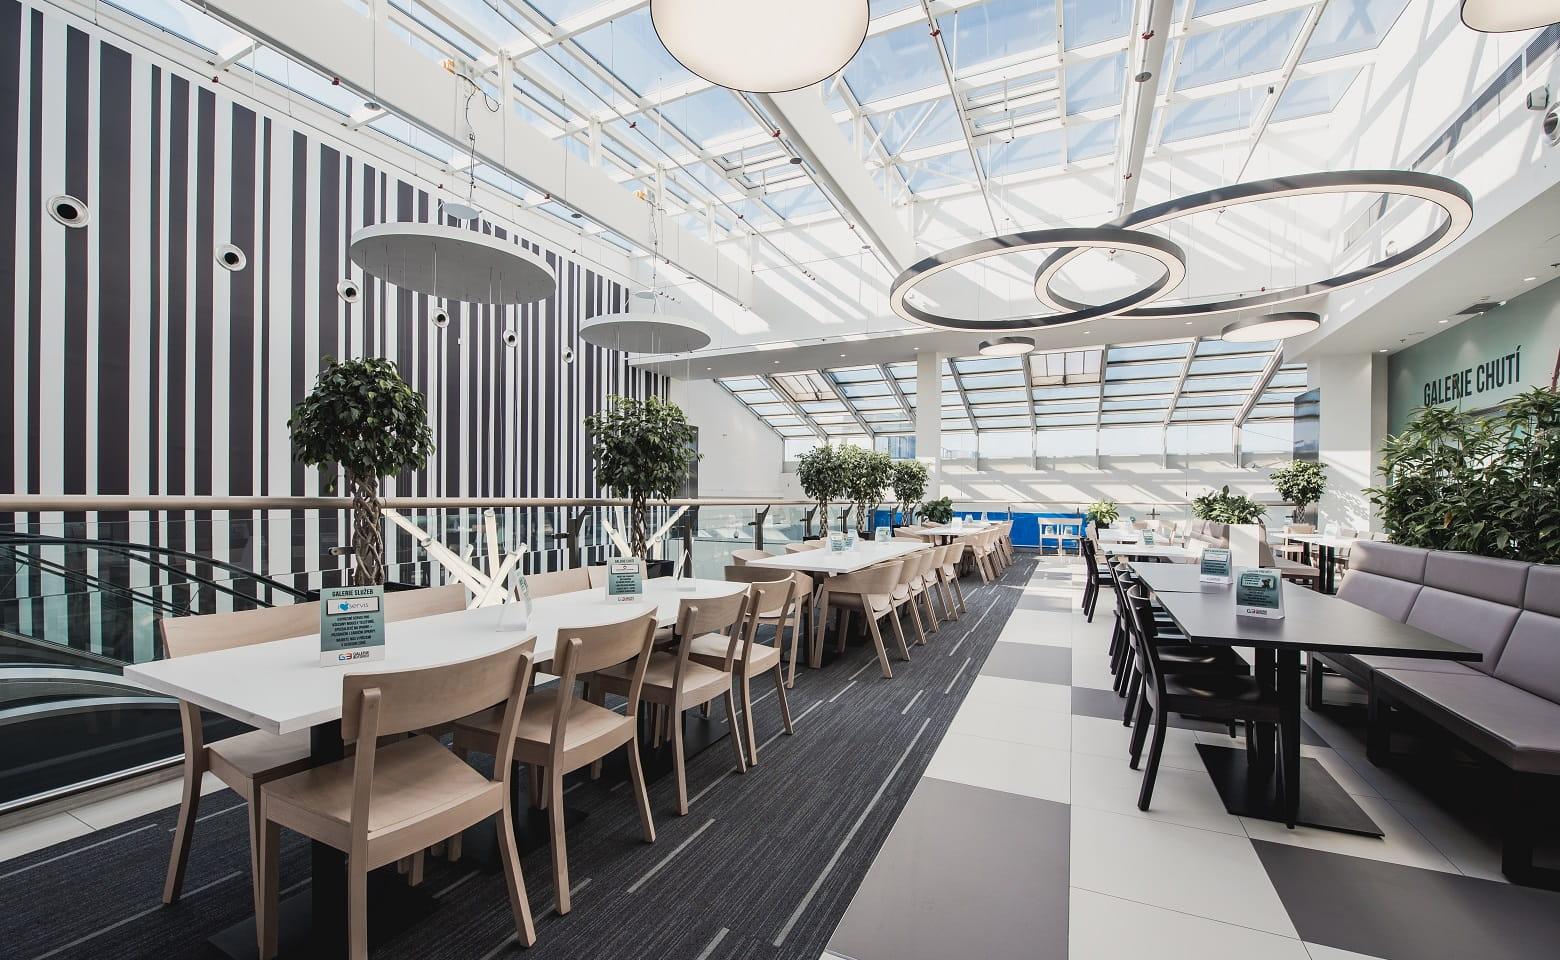 Galerie Butovice, shopping centre, gastro, restaurant